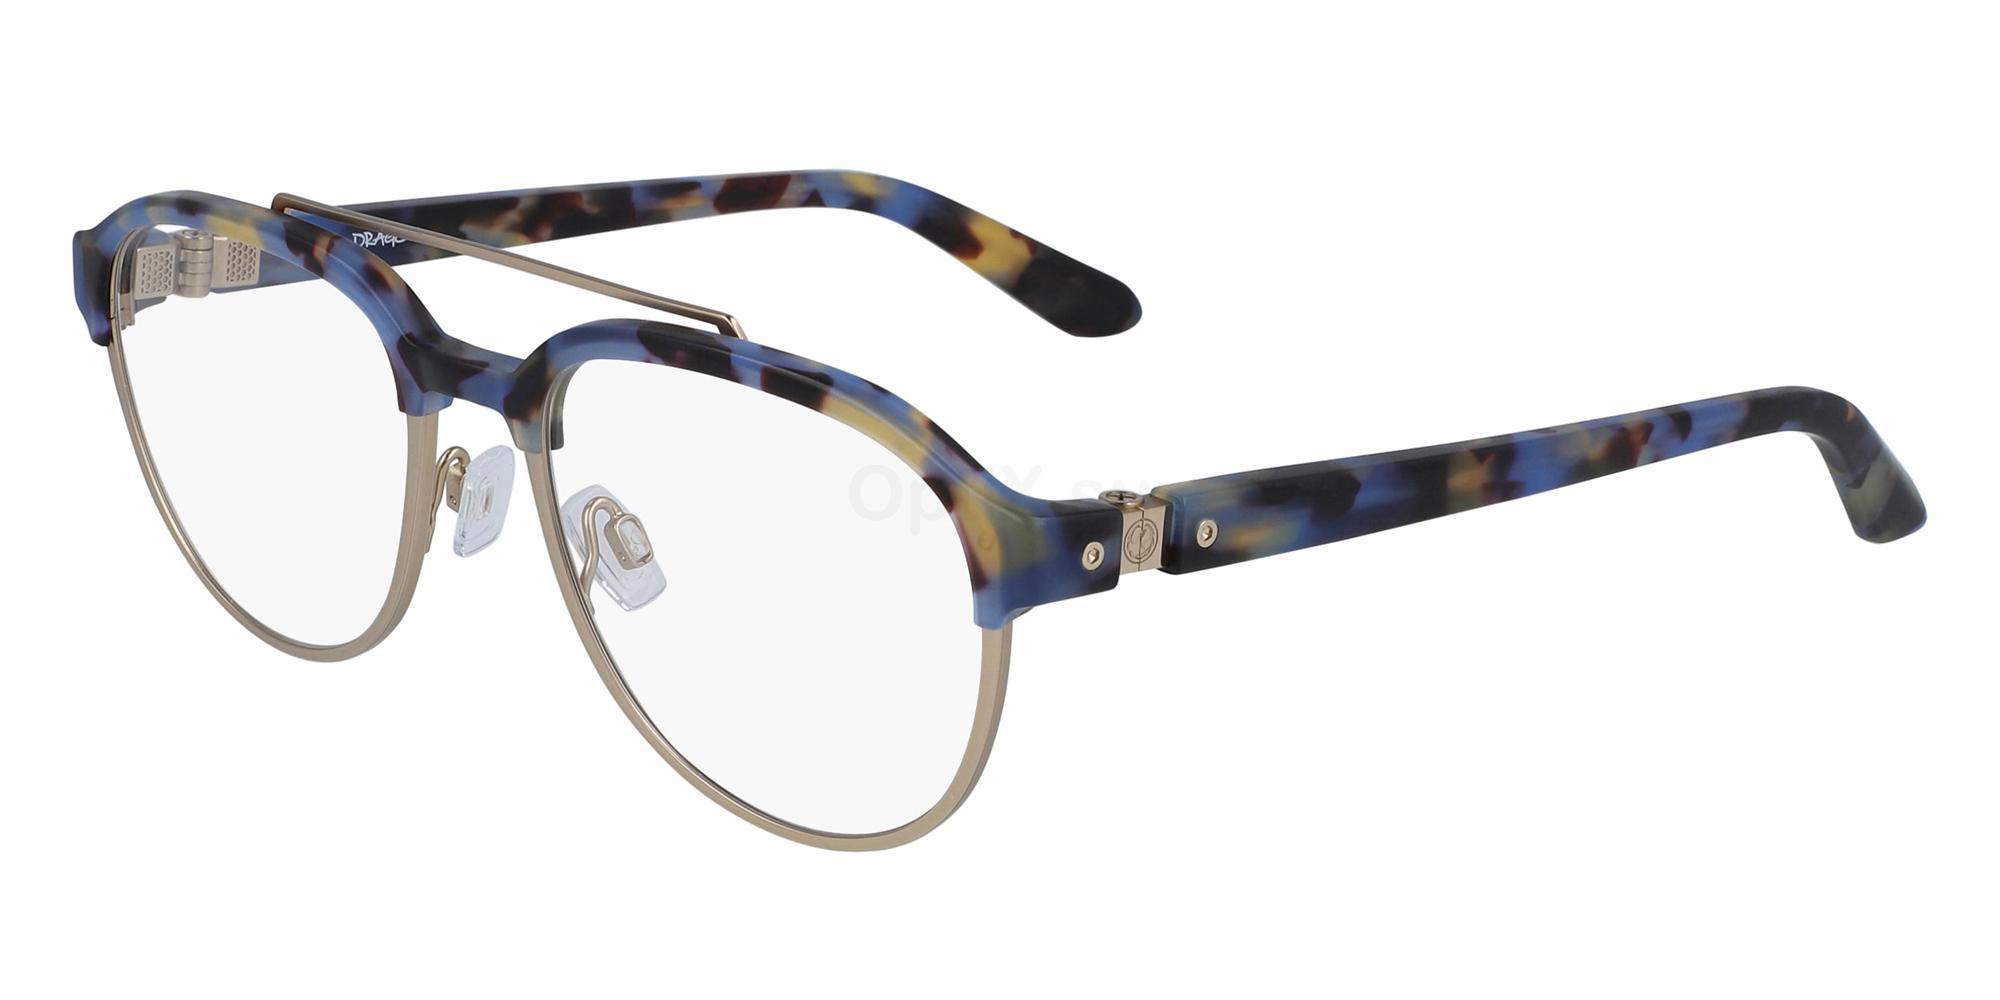 462 DR7002 Glasses, Dragon